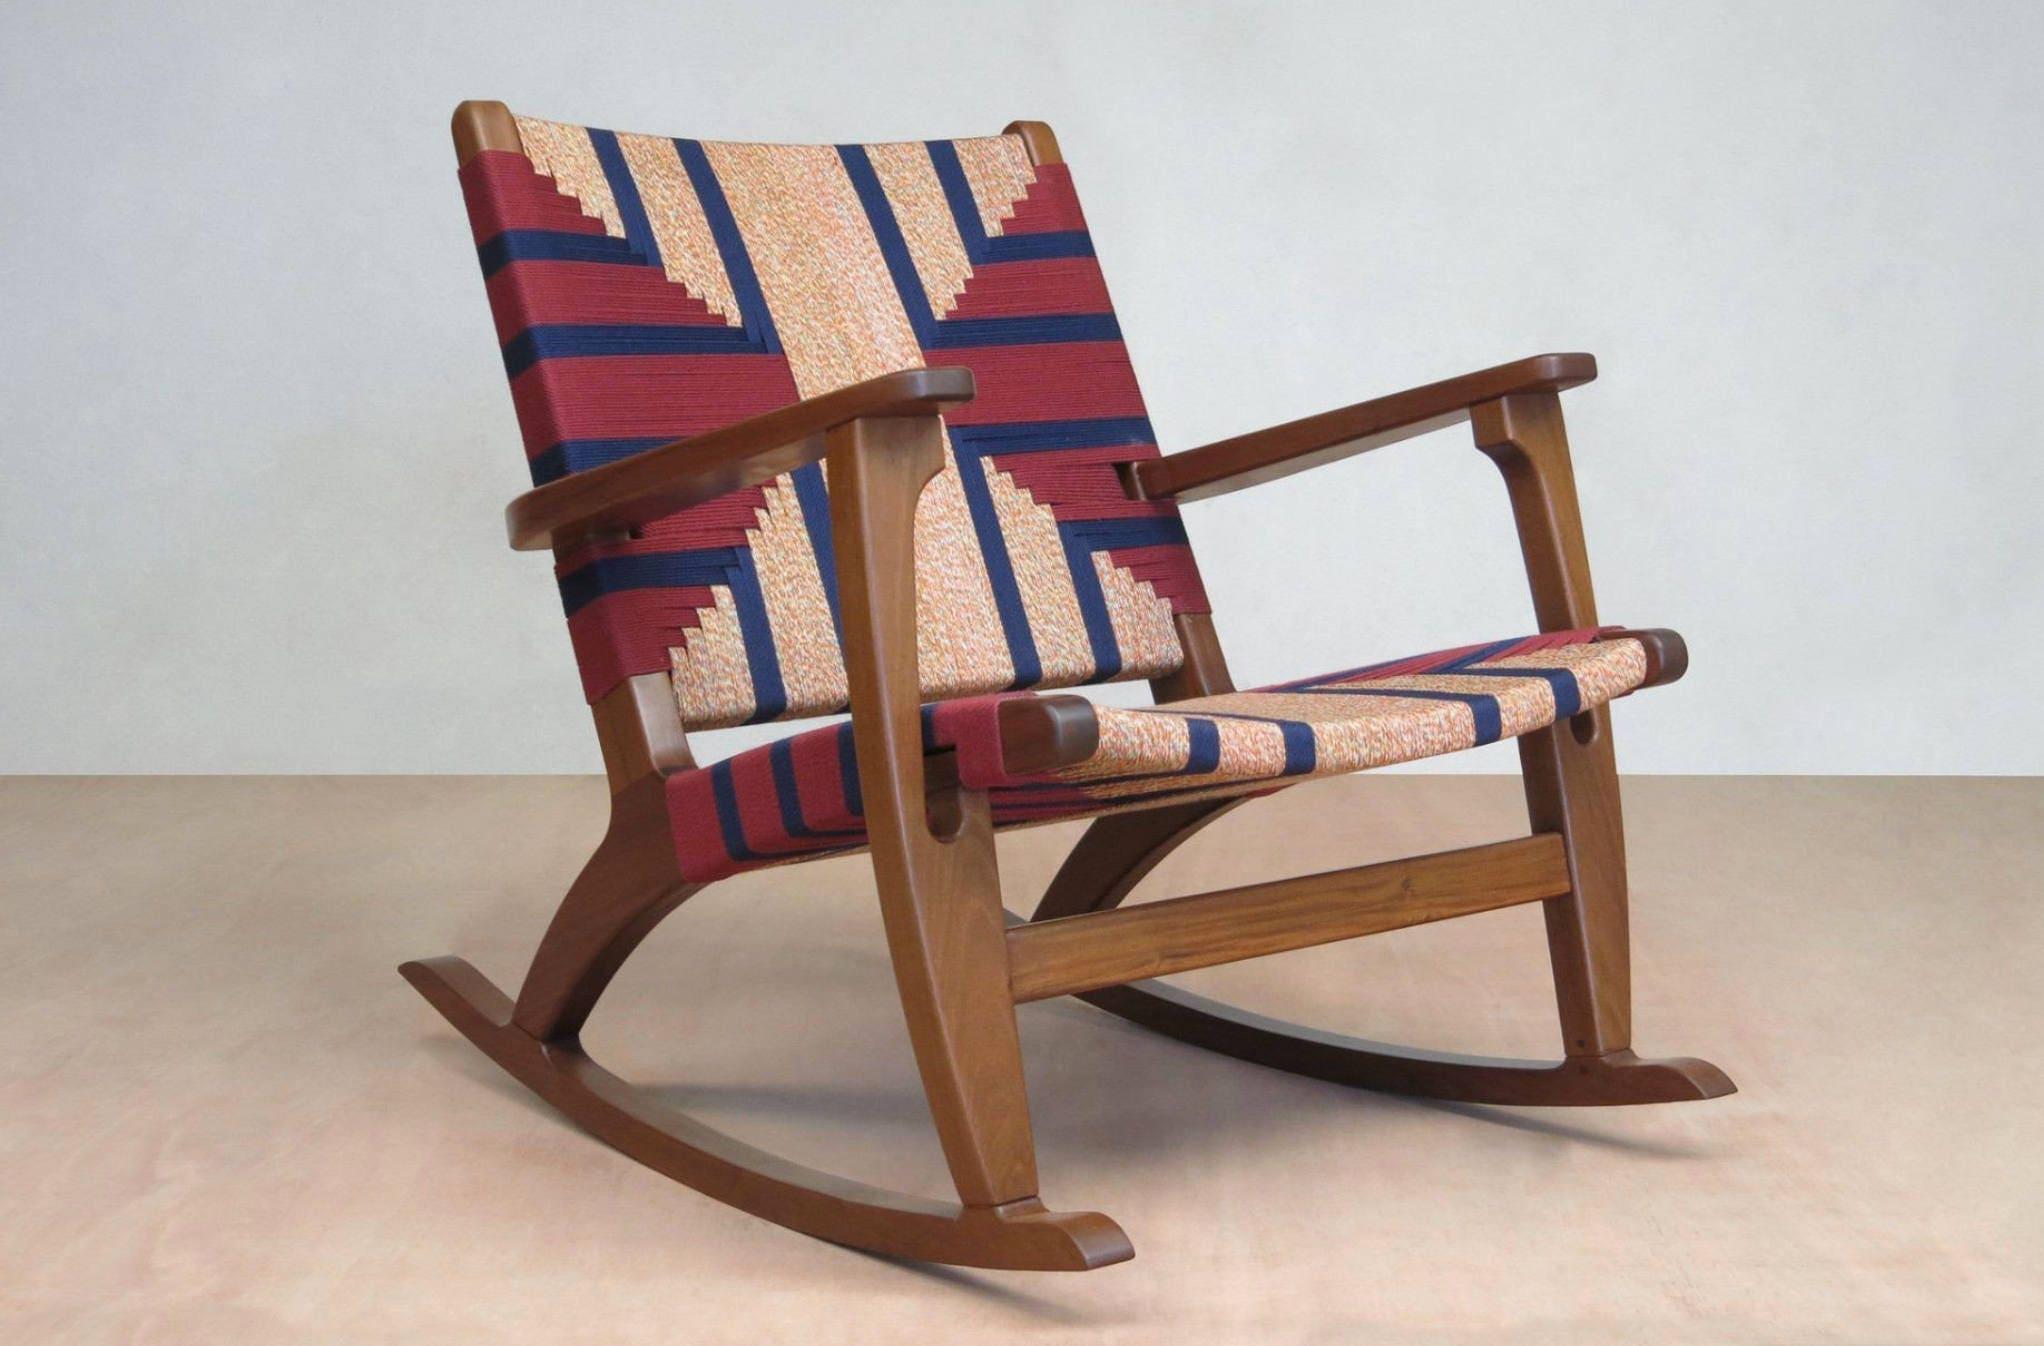 Deposit on Custom Woven Rocking Chair & Ottoman for Amanda Assadi